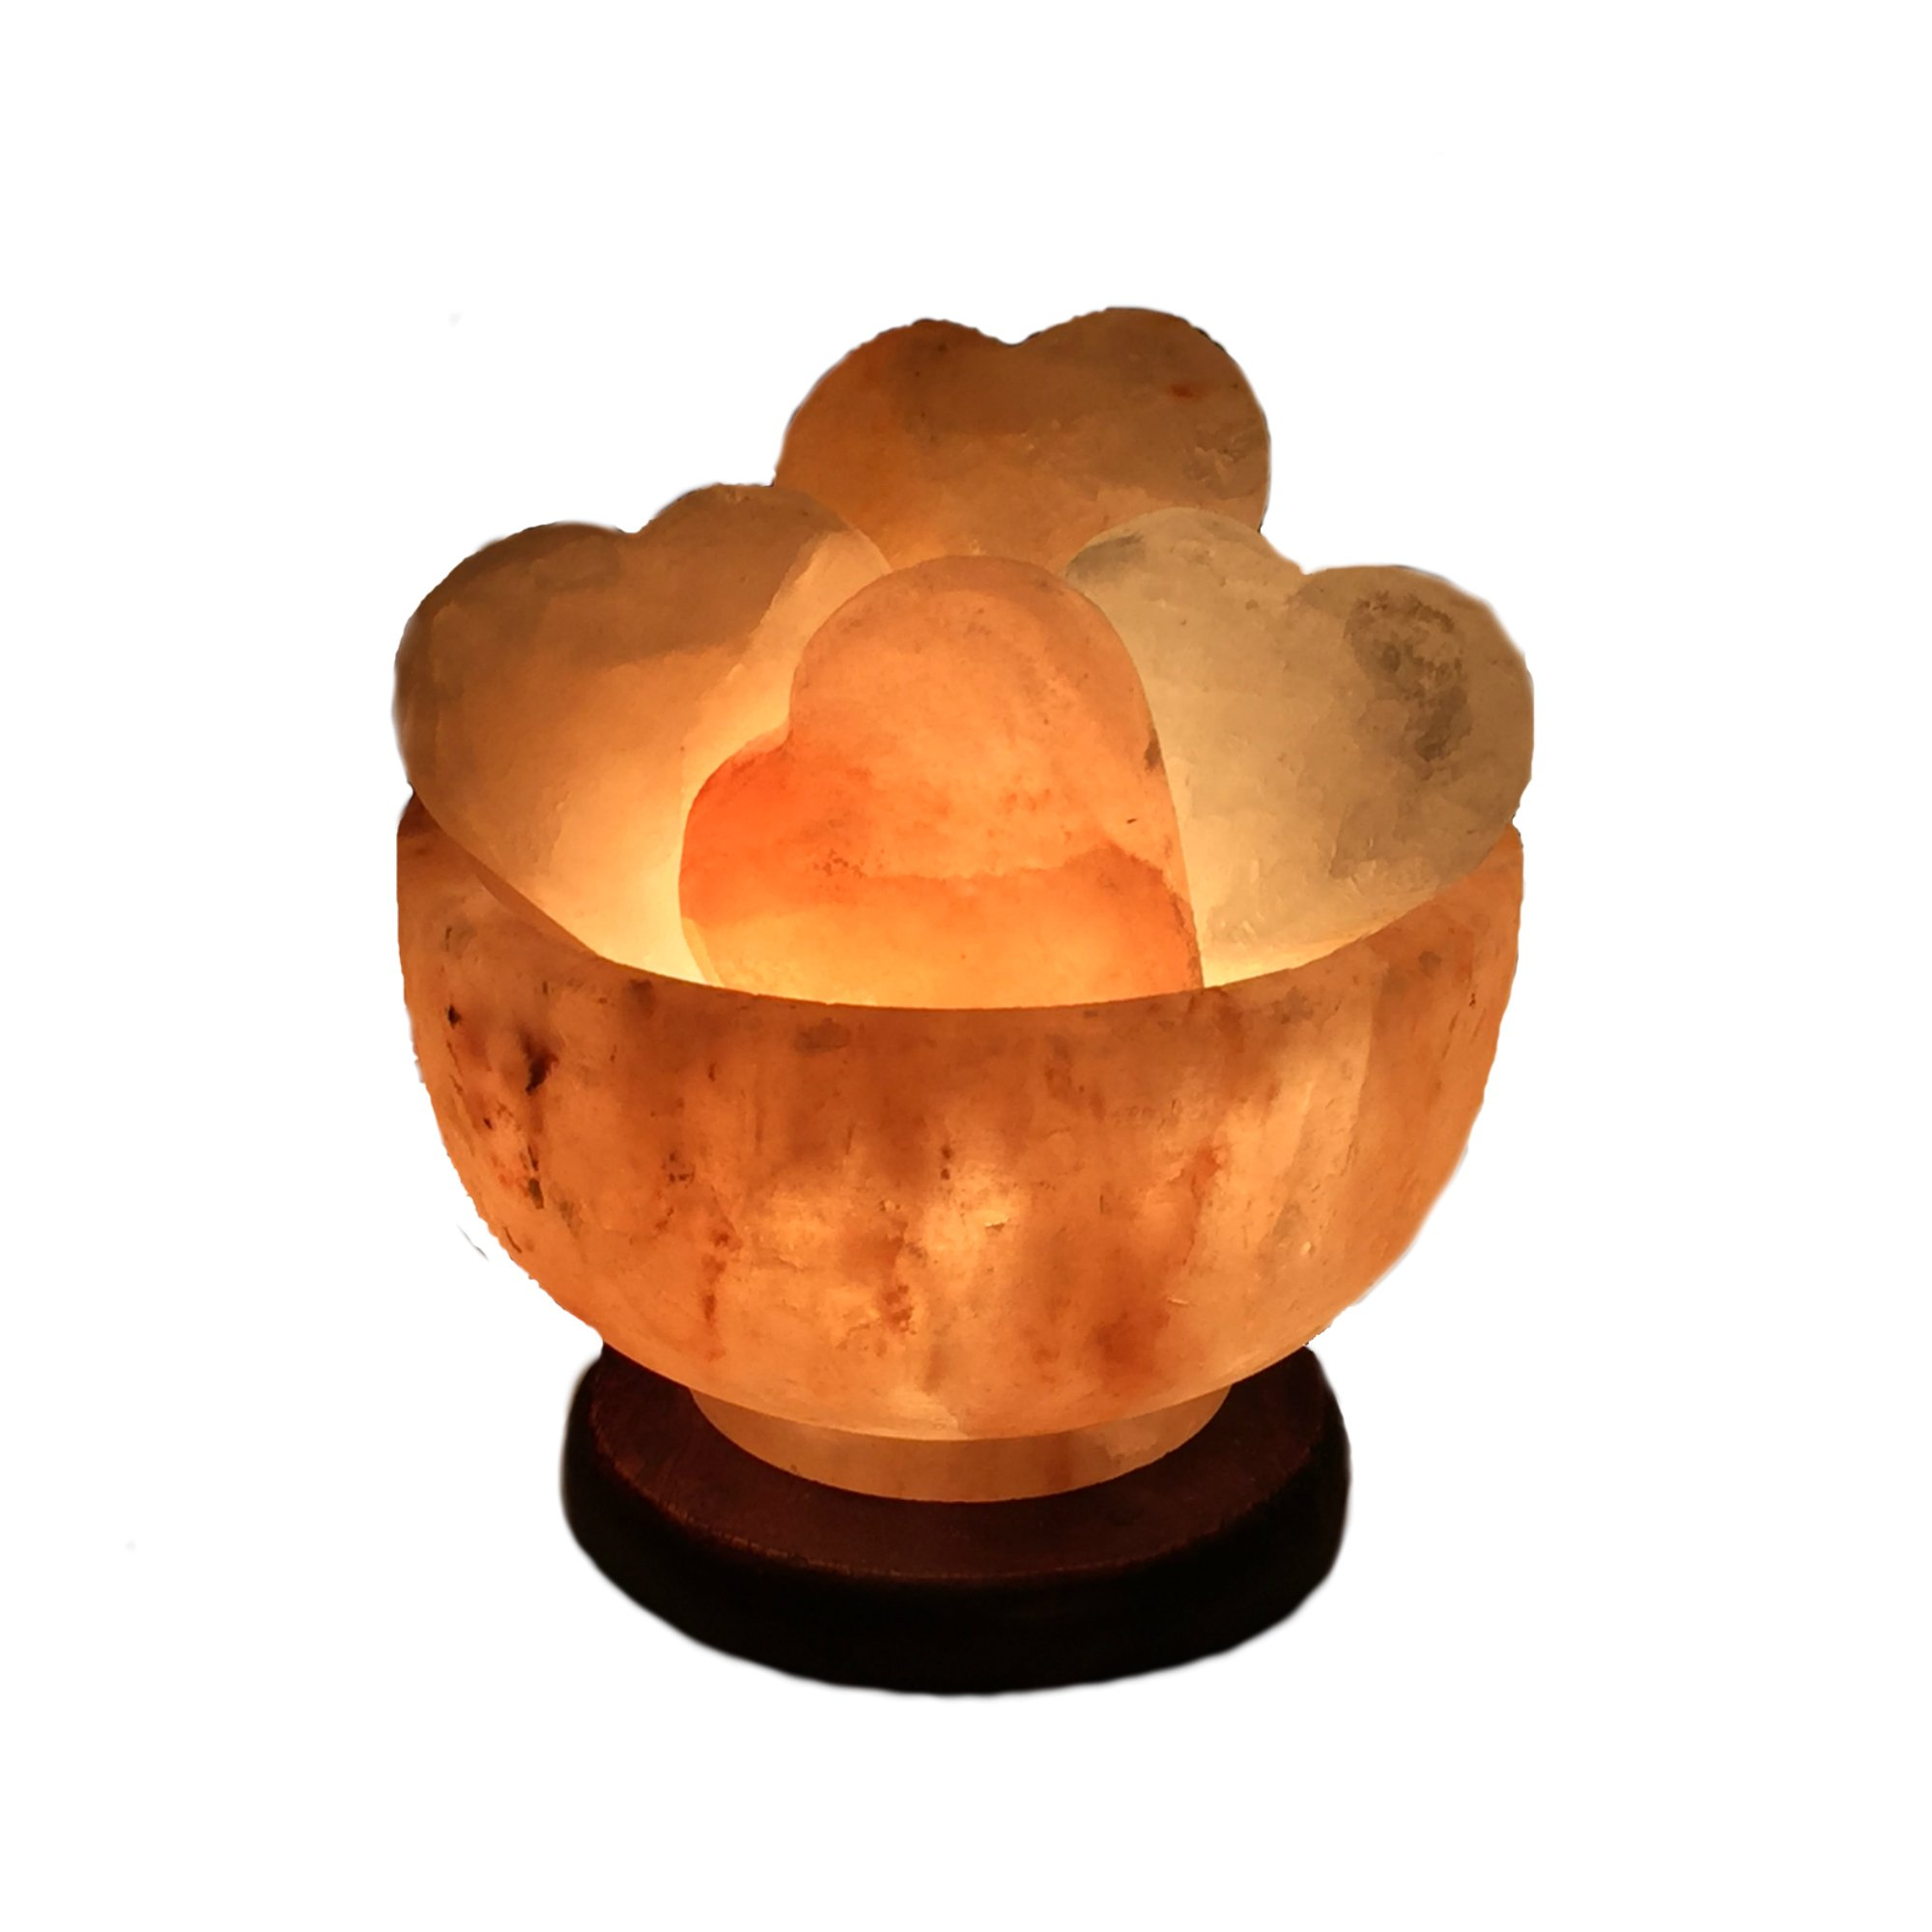 Brighter Living Organics: Himalayan Salt Fire Bowl - Abundance Bowl with Dimmer Switch | Six Shaped Massage Stones | Mounted On a Beautiful Wood Base |6''- 7''| (Heart Shaped Stones)